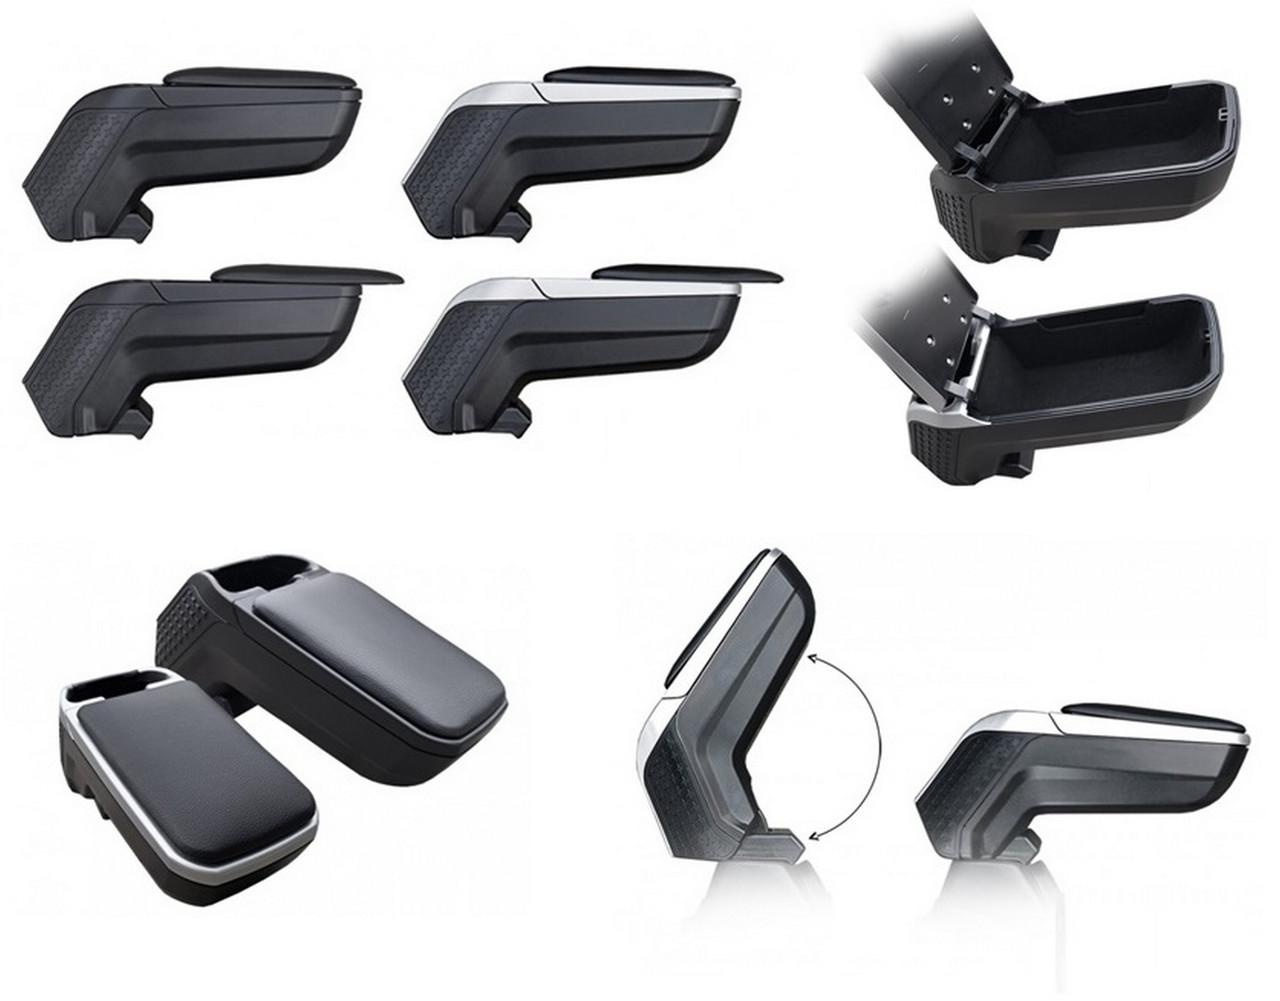 ARS4TOCIK01210S Toyota Yaris 2011-2014 armcik s4 armrest